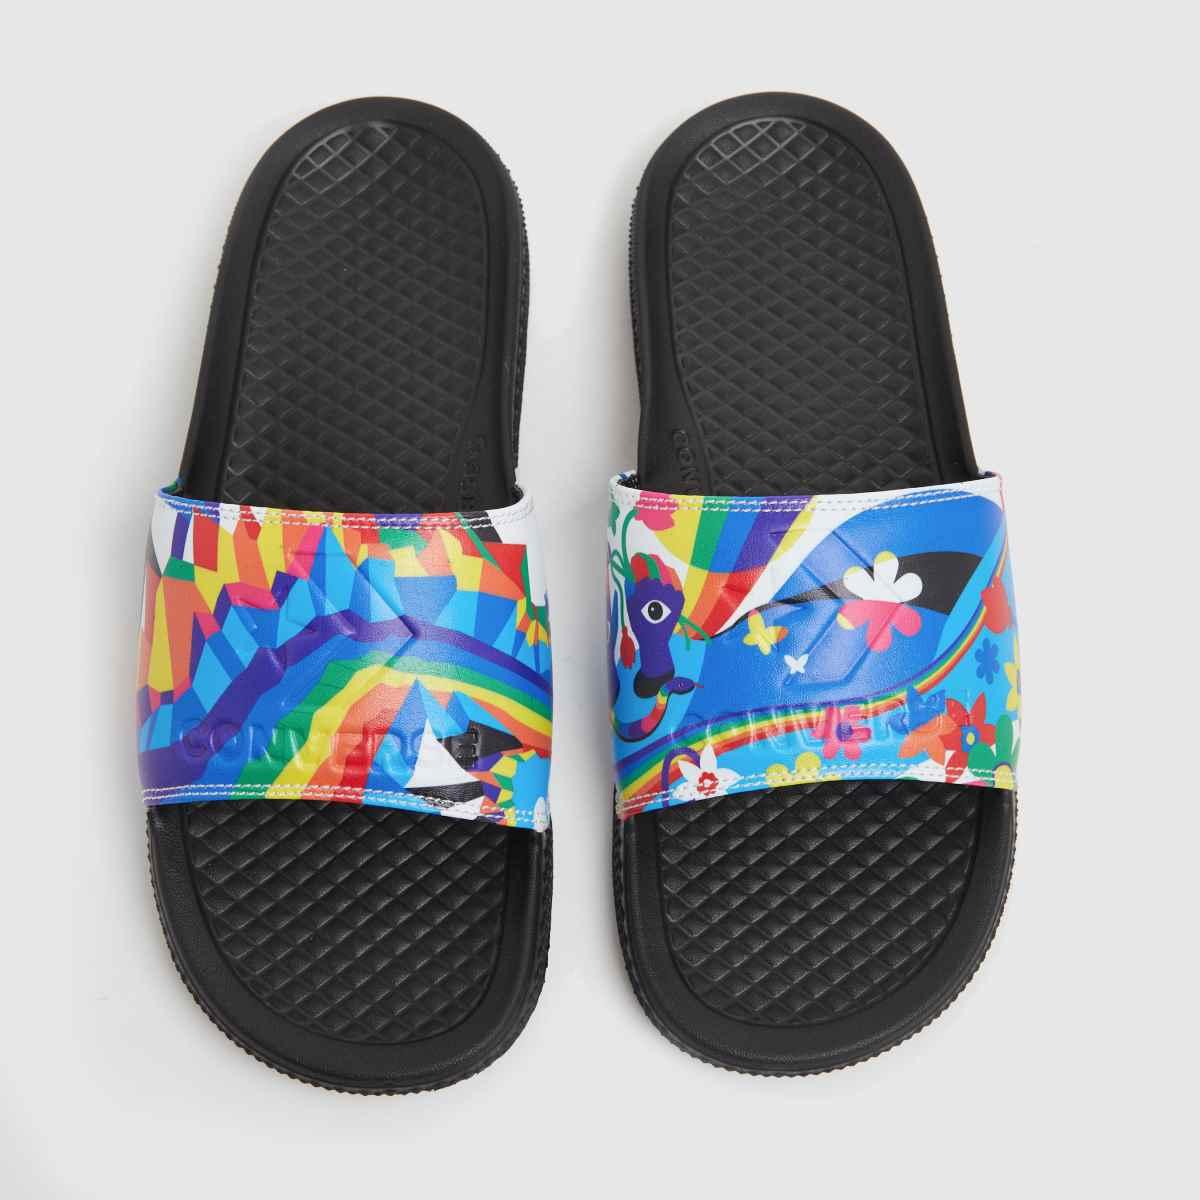 Converse Multi Pride Slide Sandals